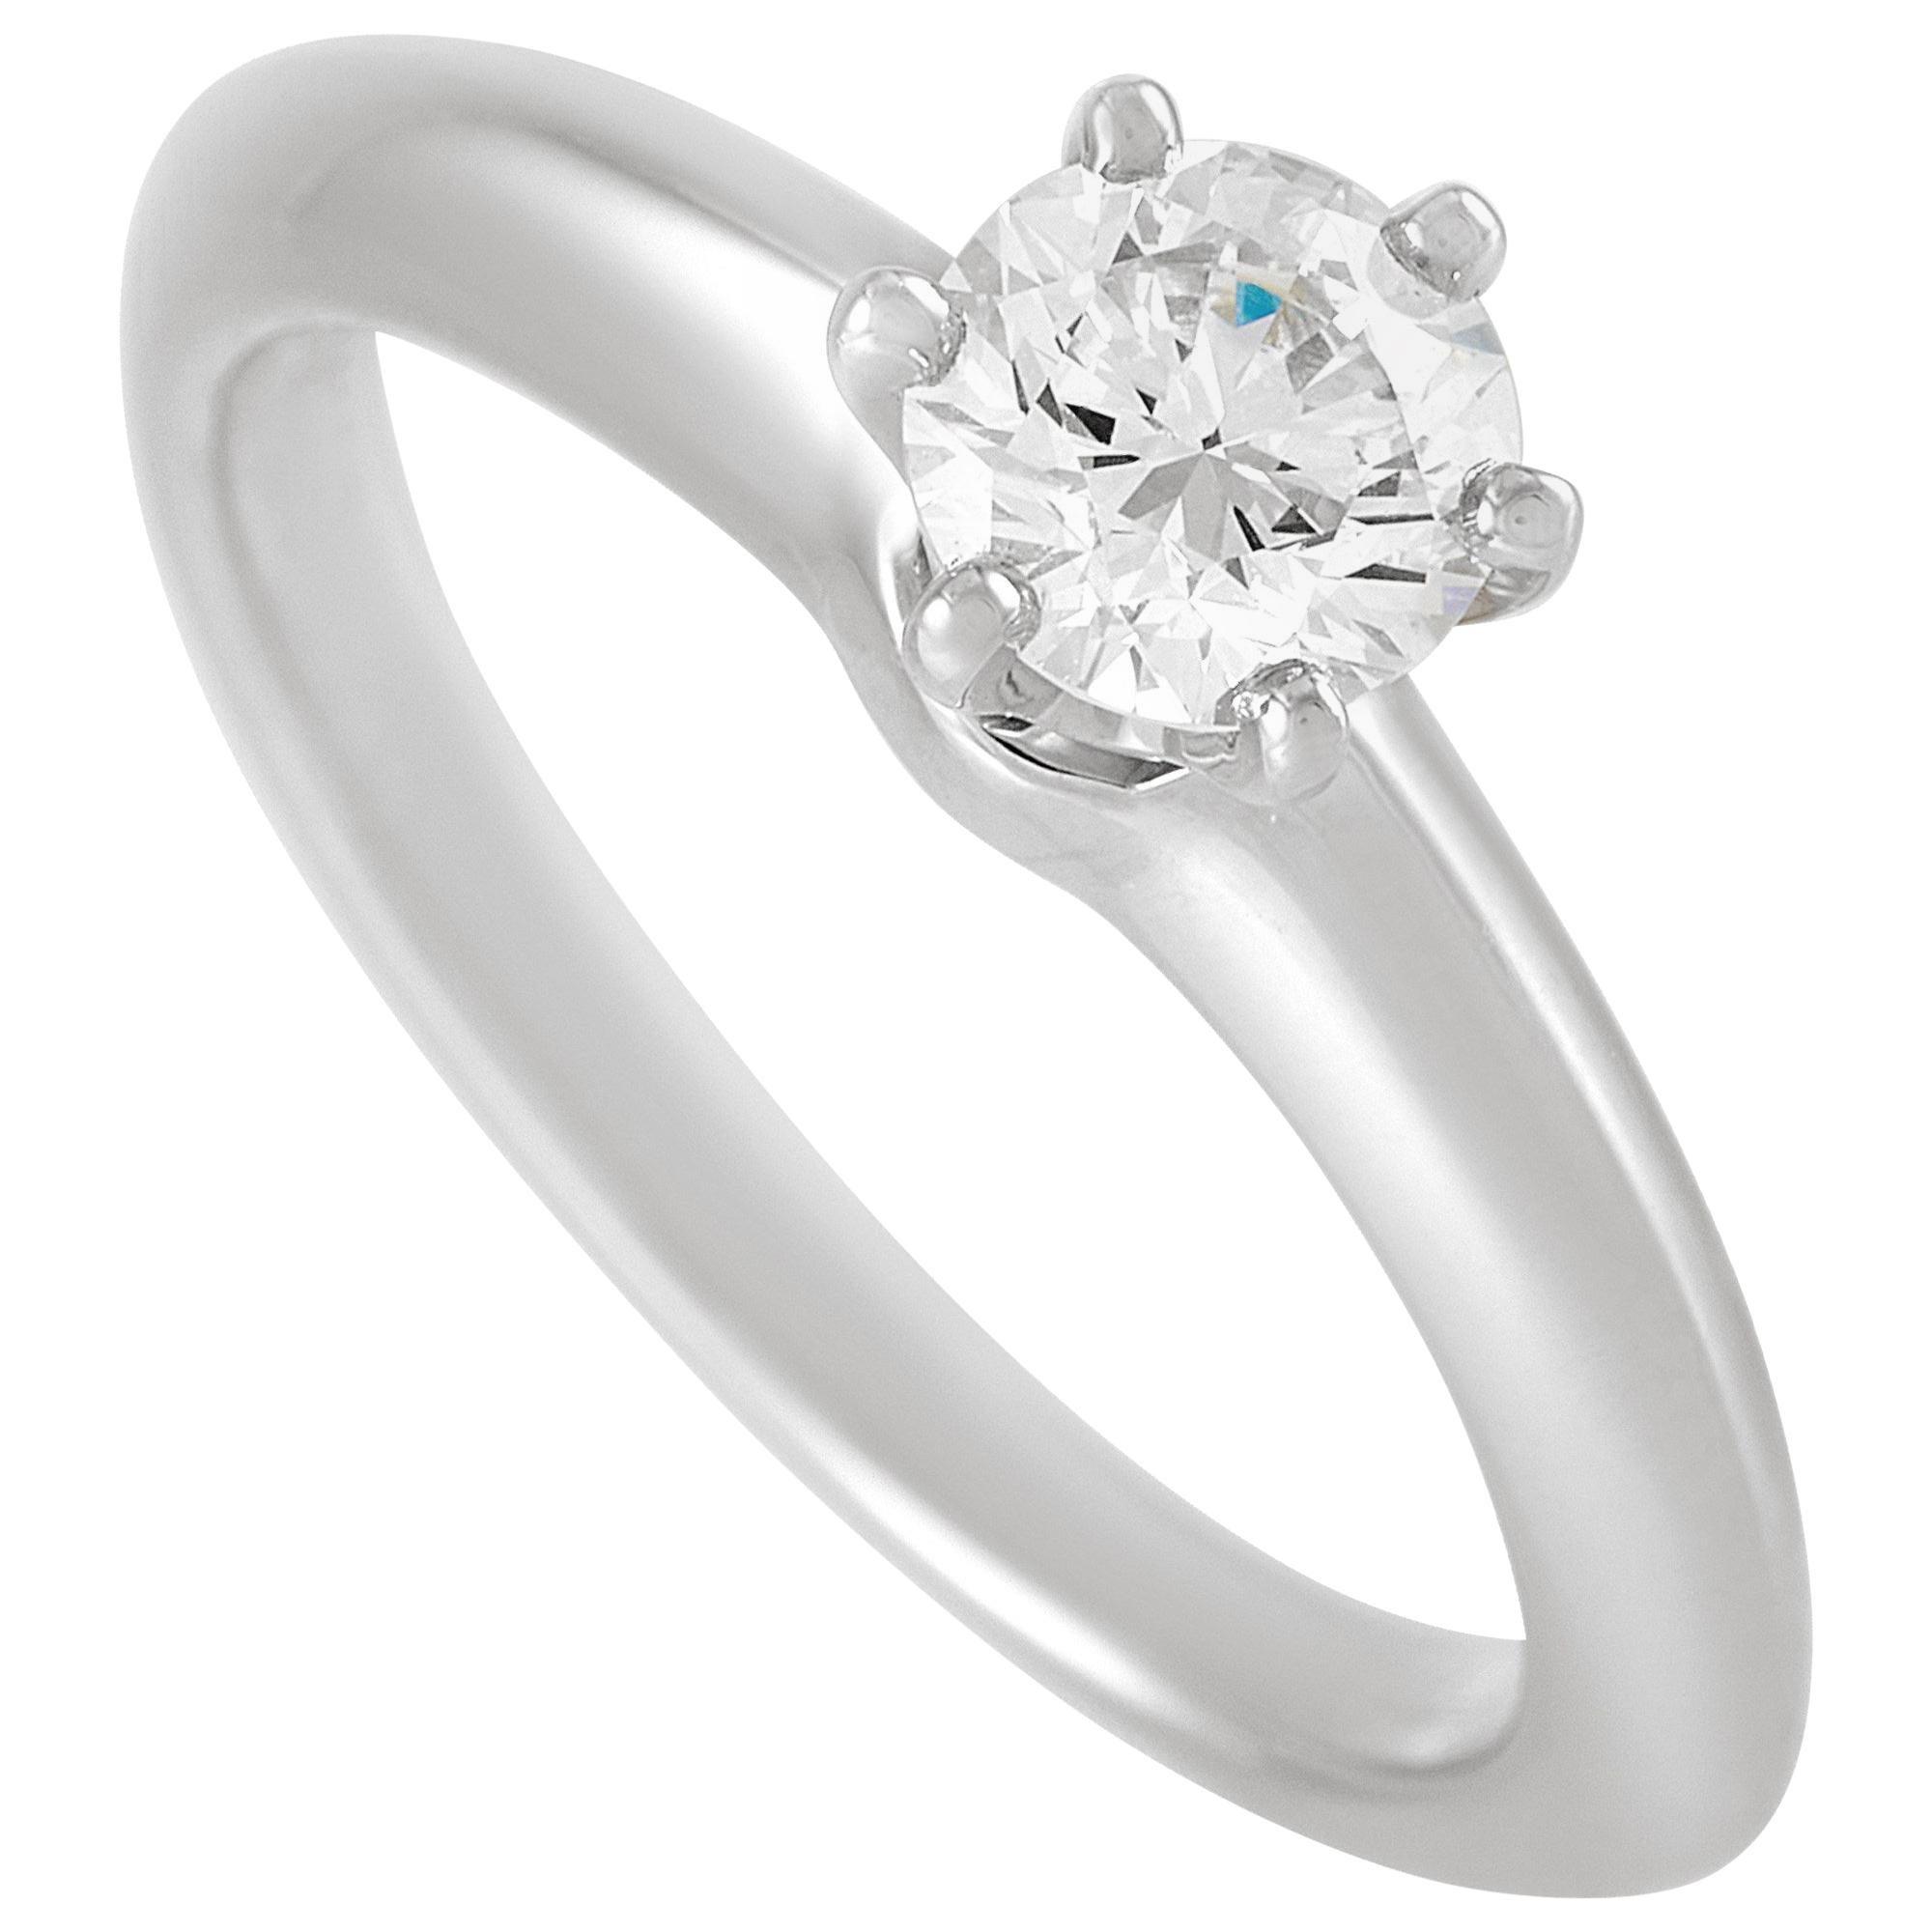 Tiffany & Co. Platinum Solitaire 0.52 Carat Diamond Ring